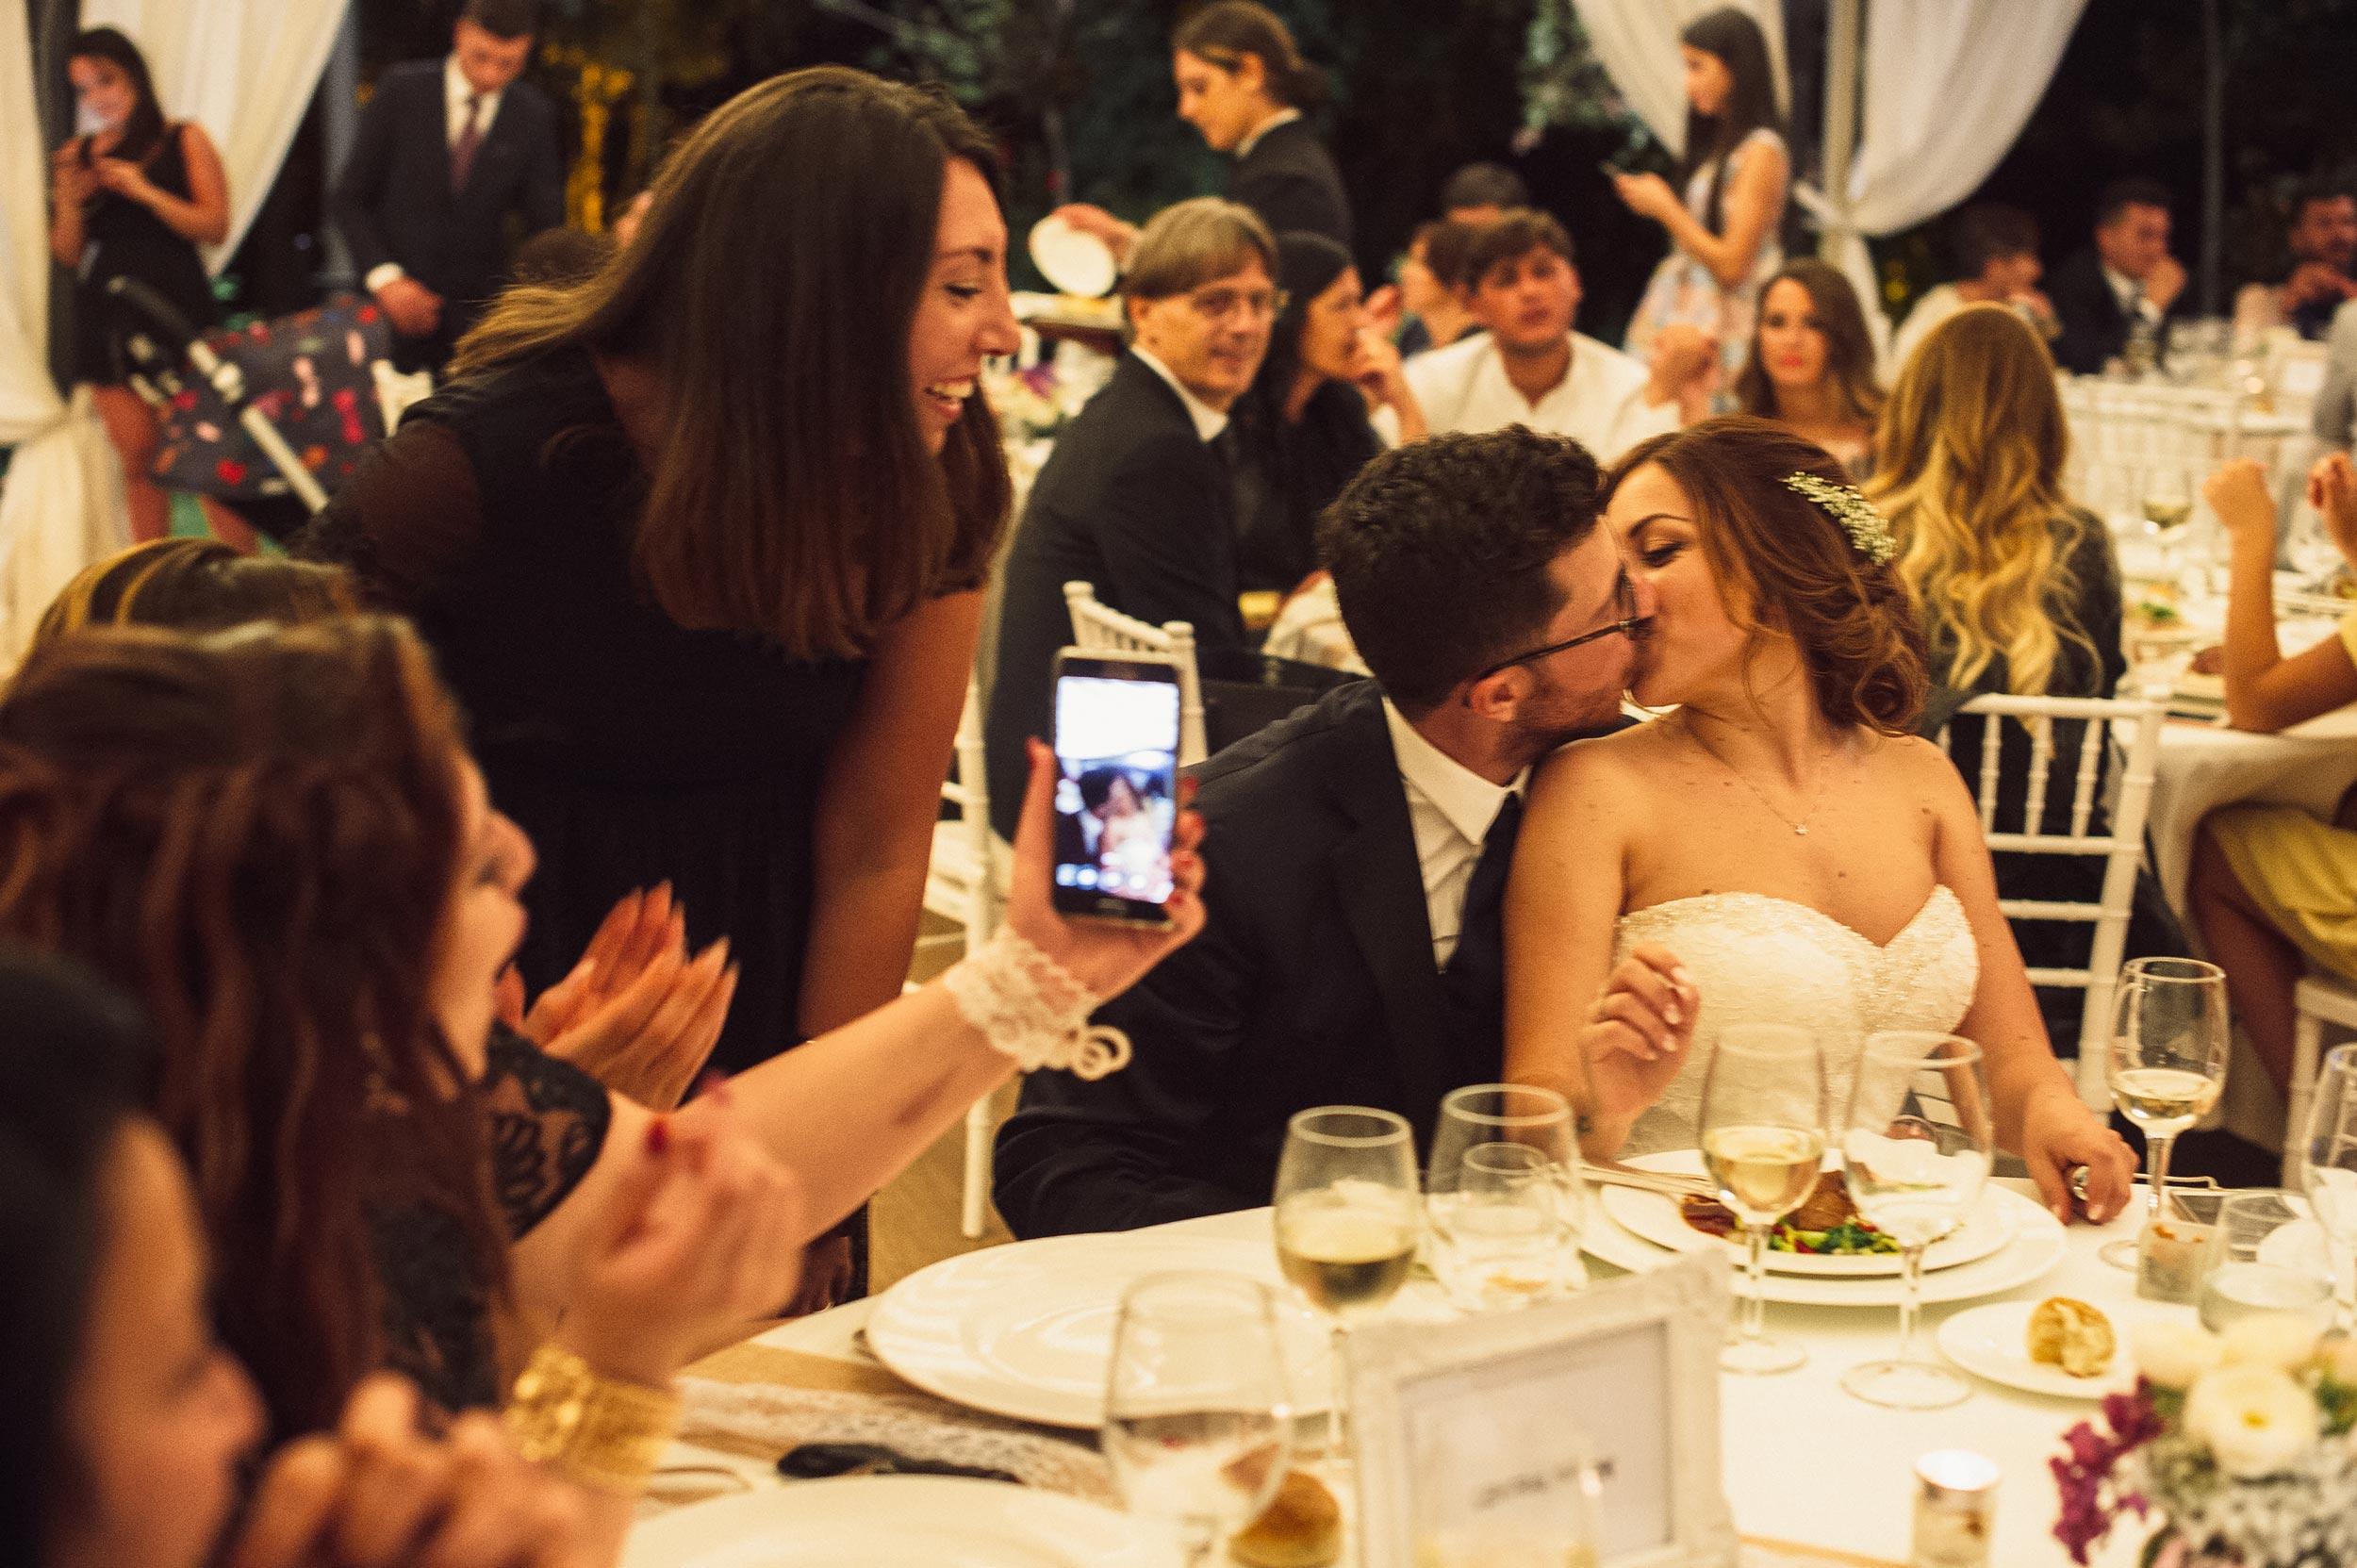 2016-Claudio-Teresa-Naples-Wedding-Photographer-Italy-Alessandro-Avenali-122.jpg